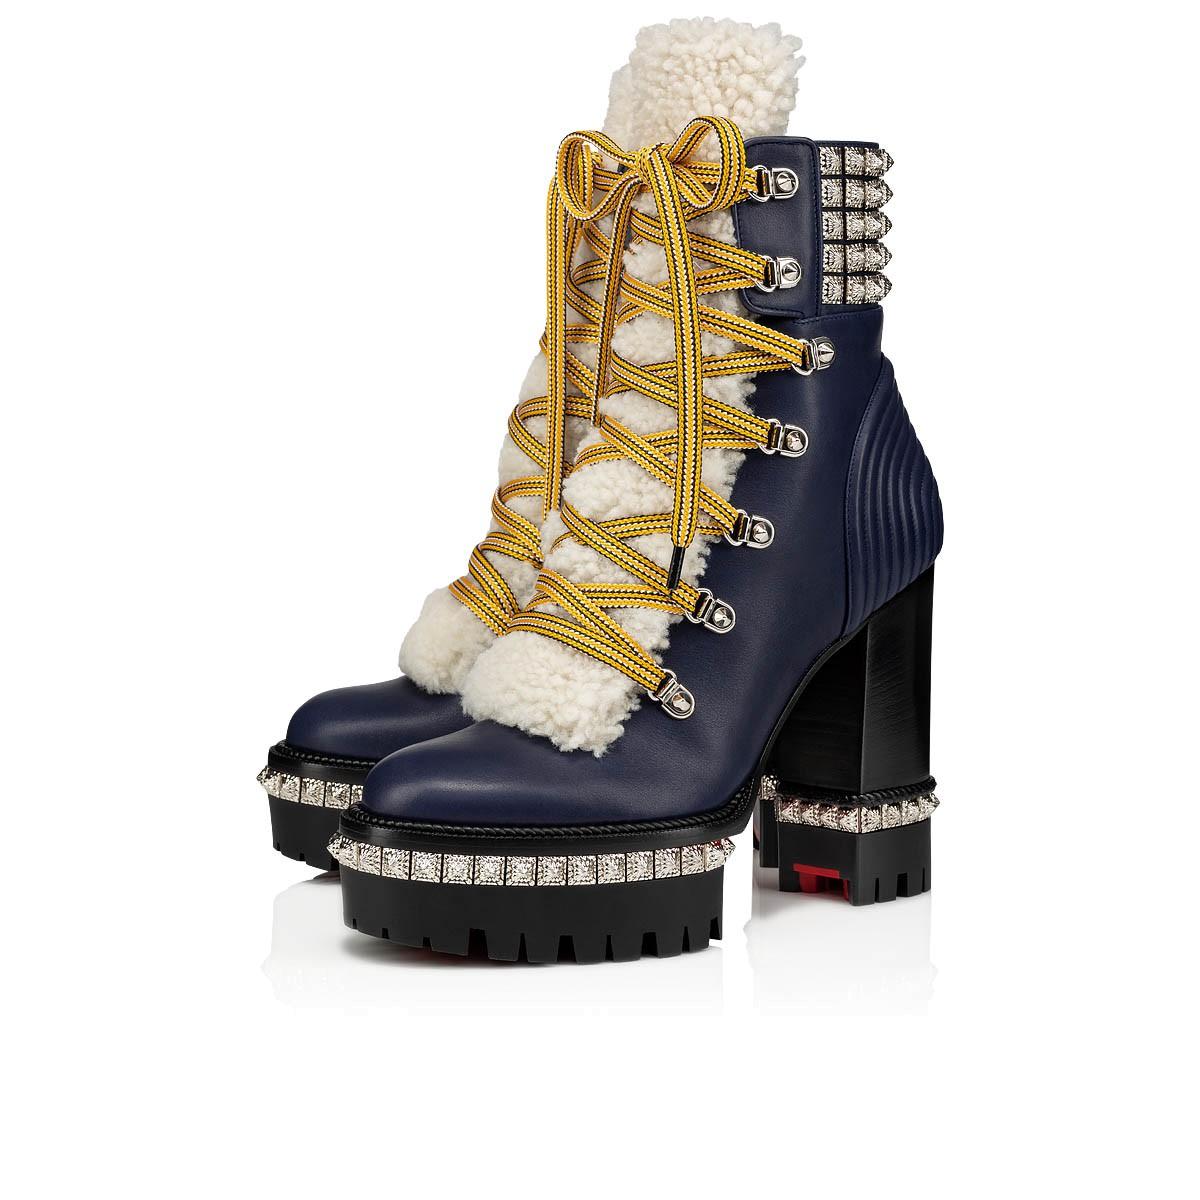 Shoes - Yeti Donna - Christian Louboutin